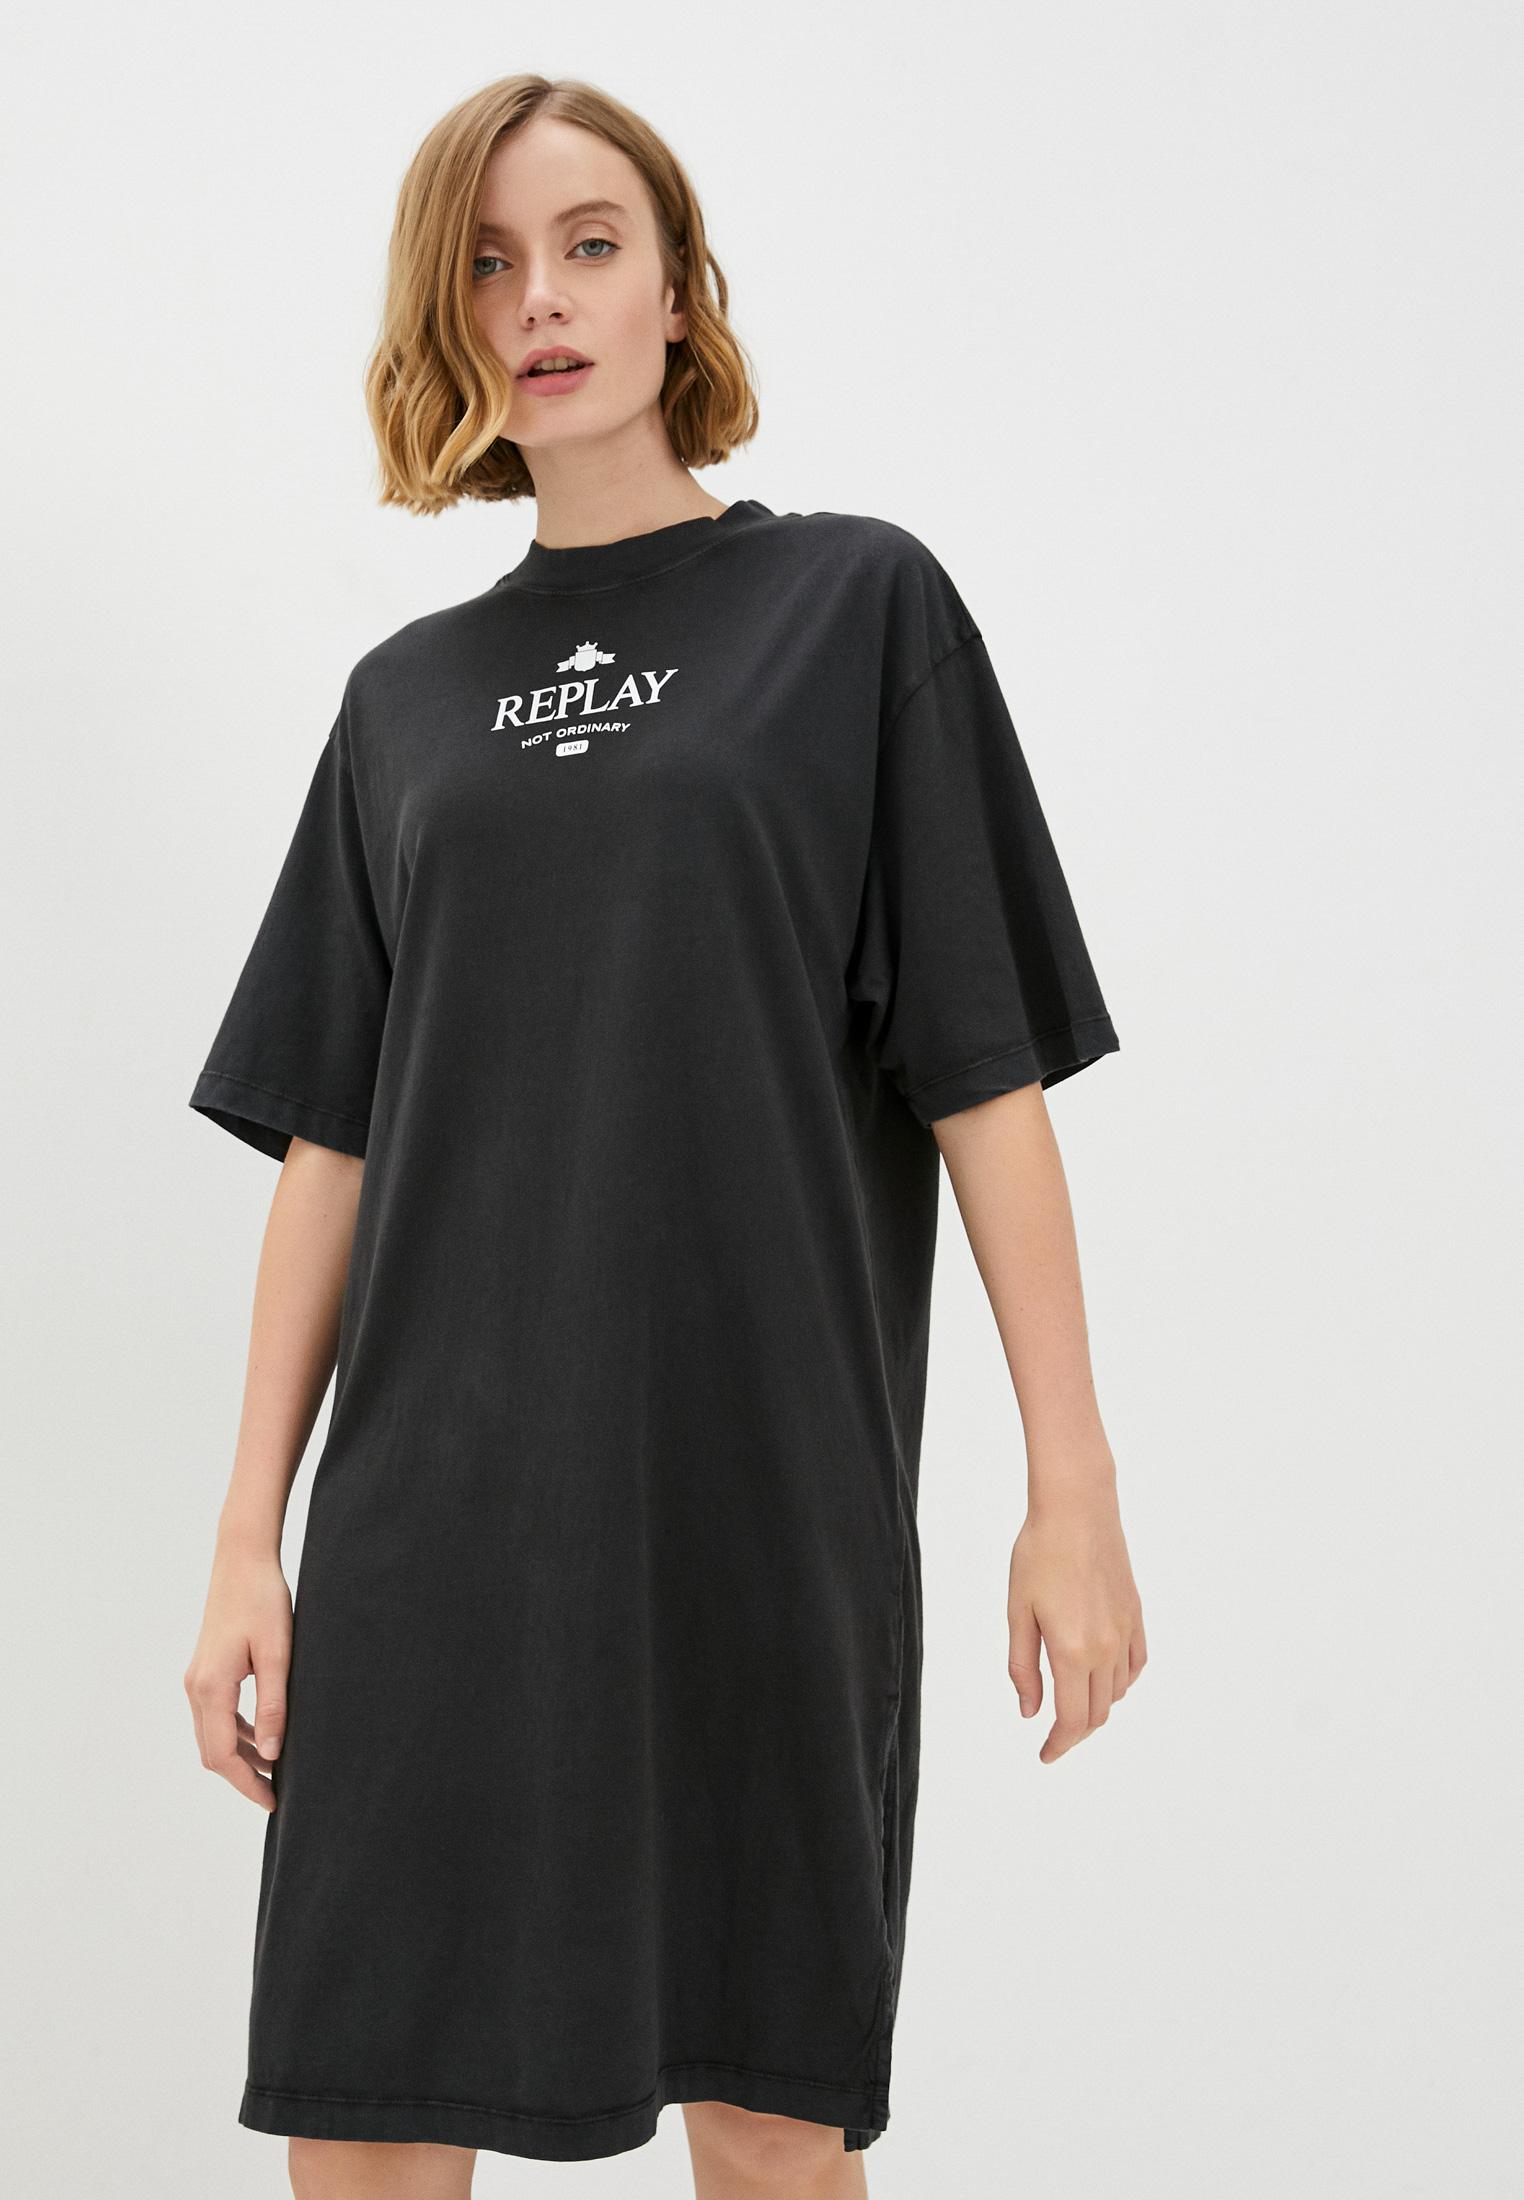 Платье Replay (Реплей) W9713.000.23178LG